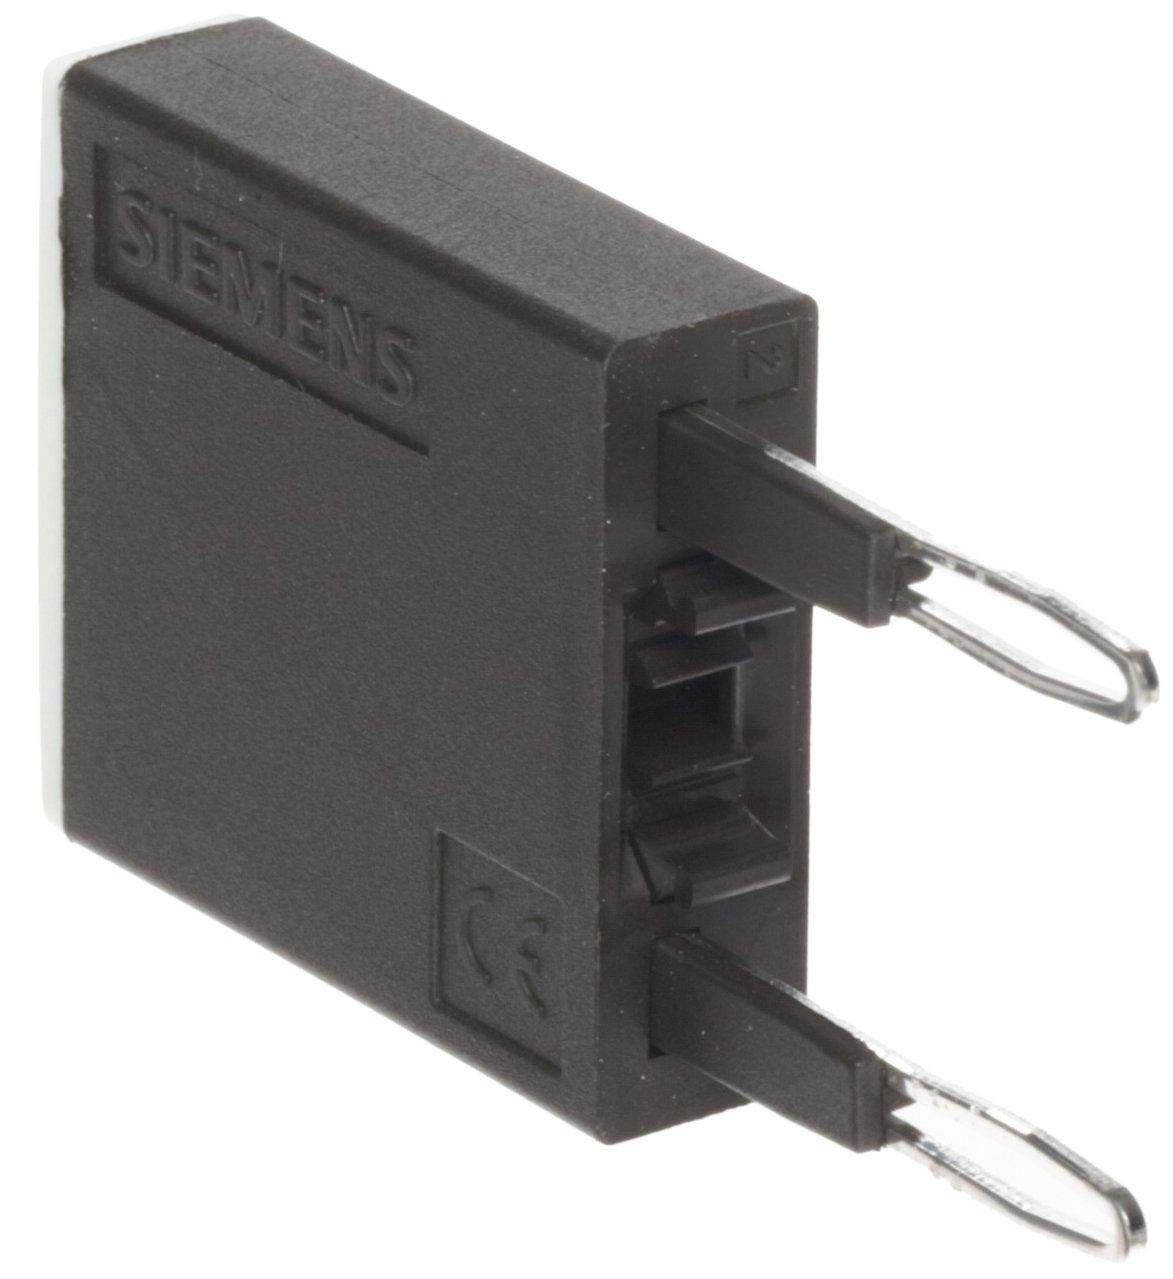 Siemens 3RT19 16-1BC00 Surge Suppressor, Varistor Design, S00 Size, 48-127VAC Rated Control Supply Voltage